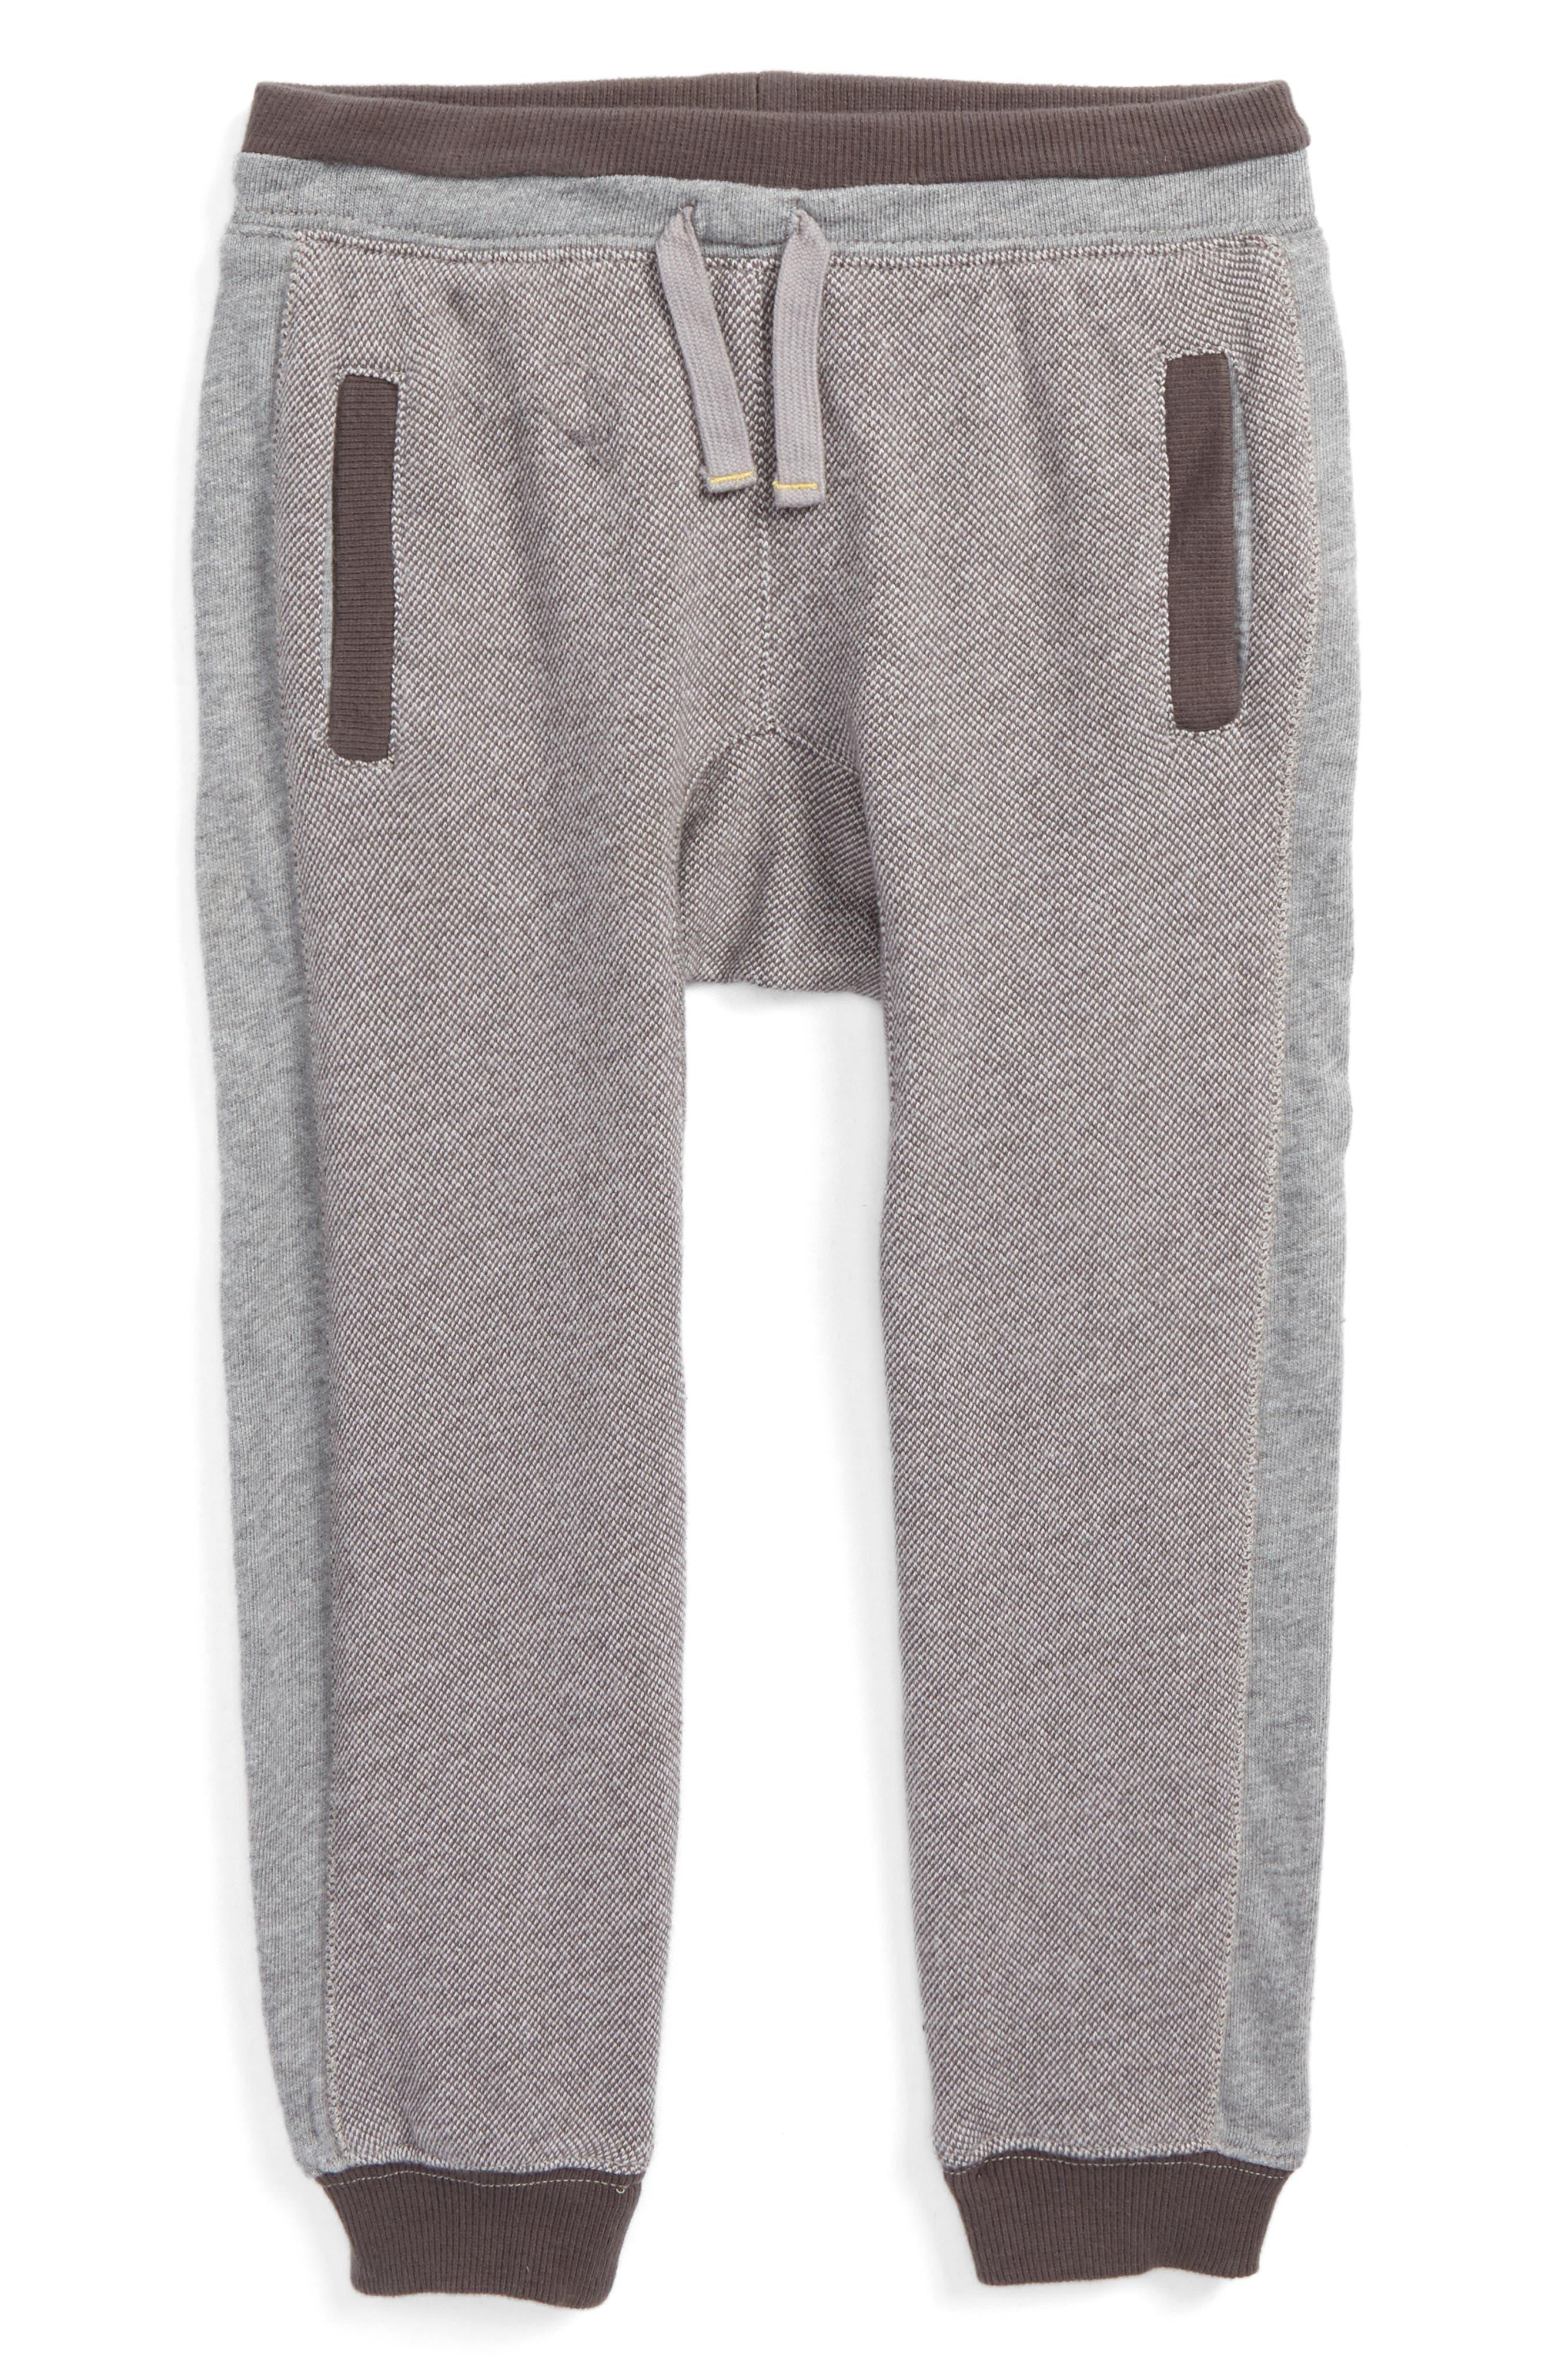 Main Image - Splendid Birdseye Knit Jogger Pants (Toddler Boys & Little Boys)